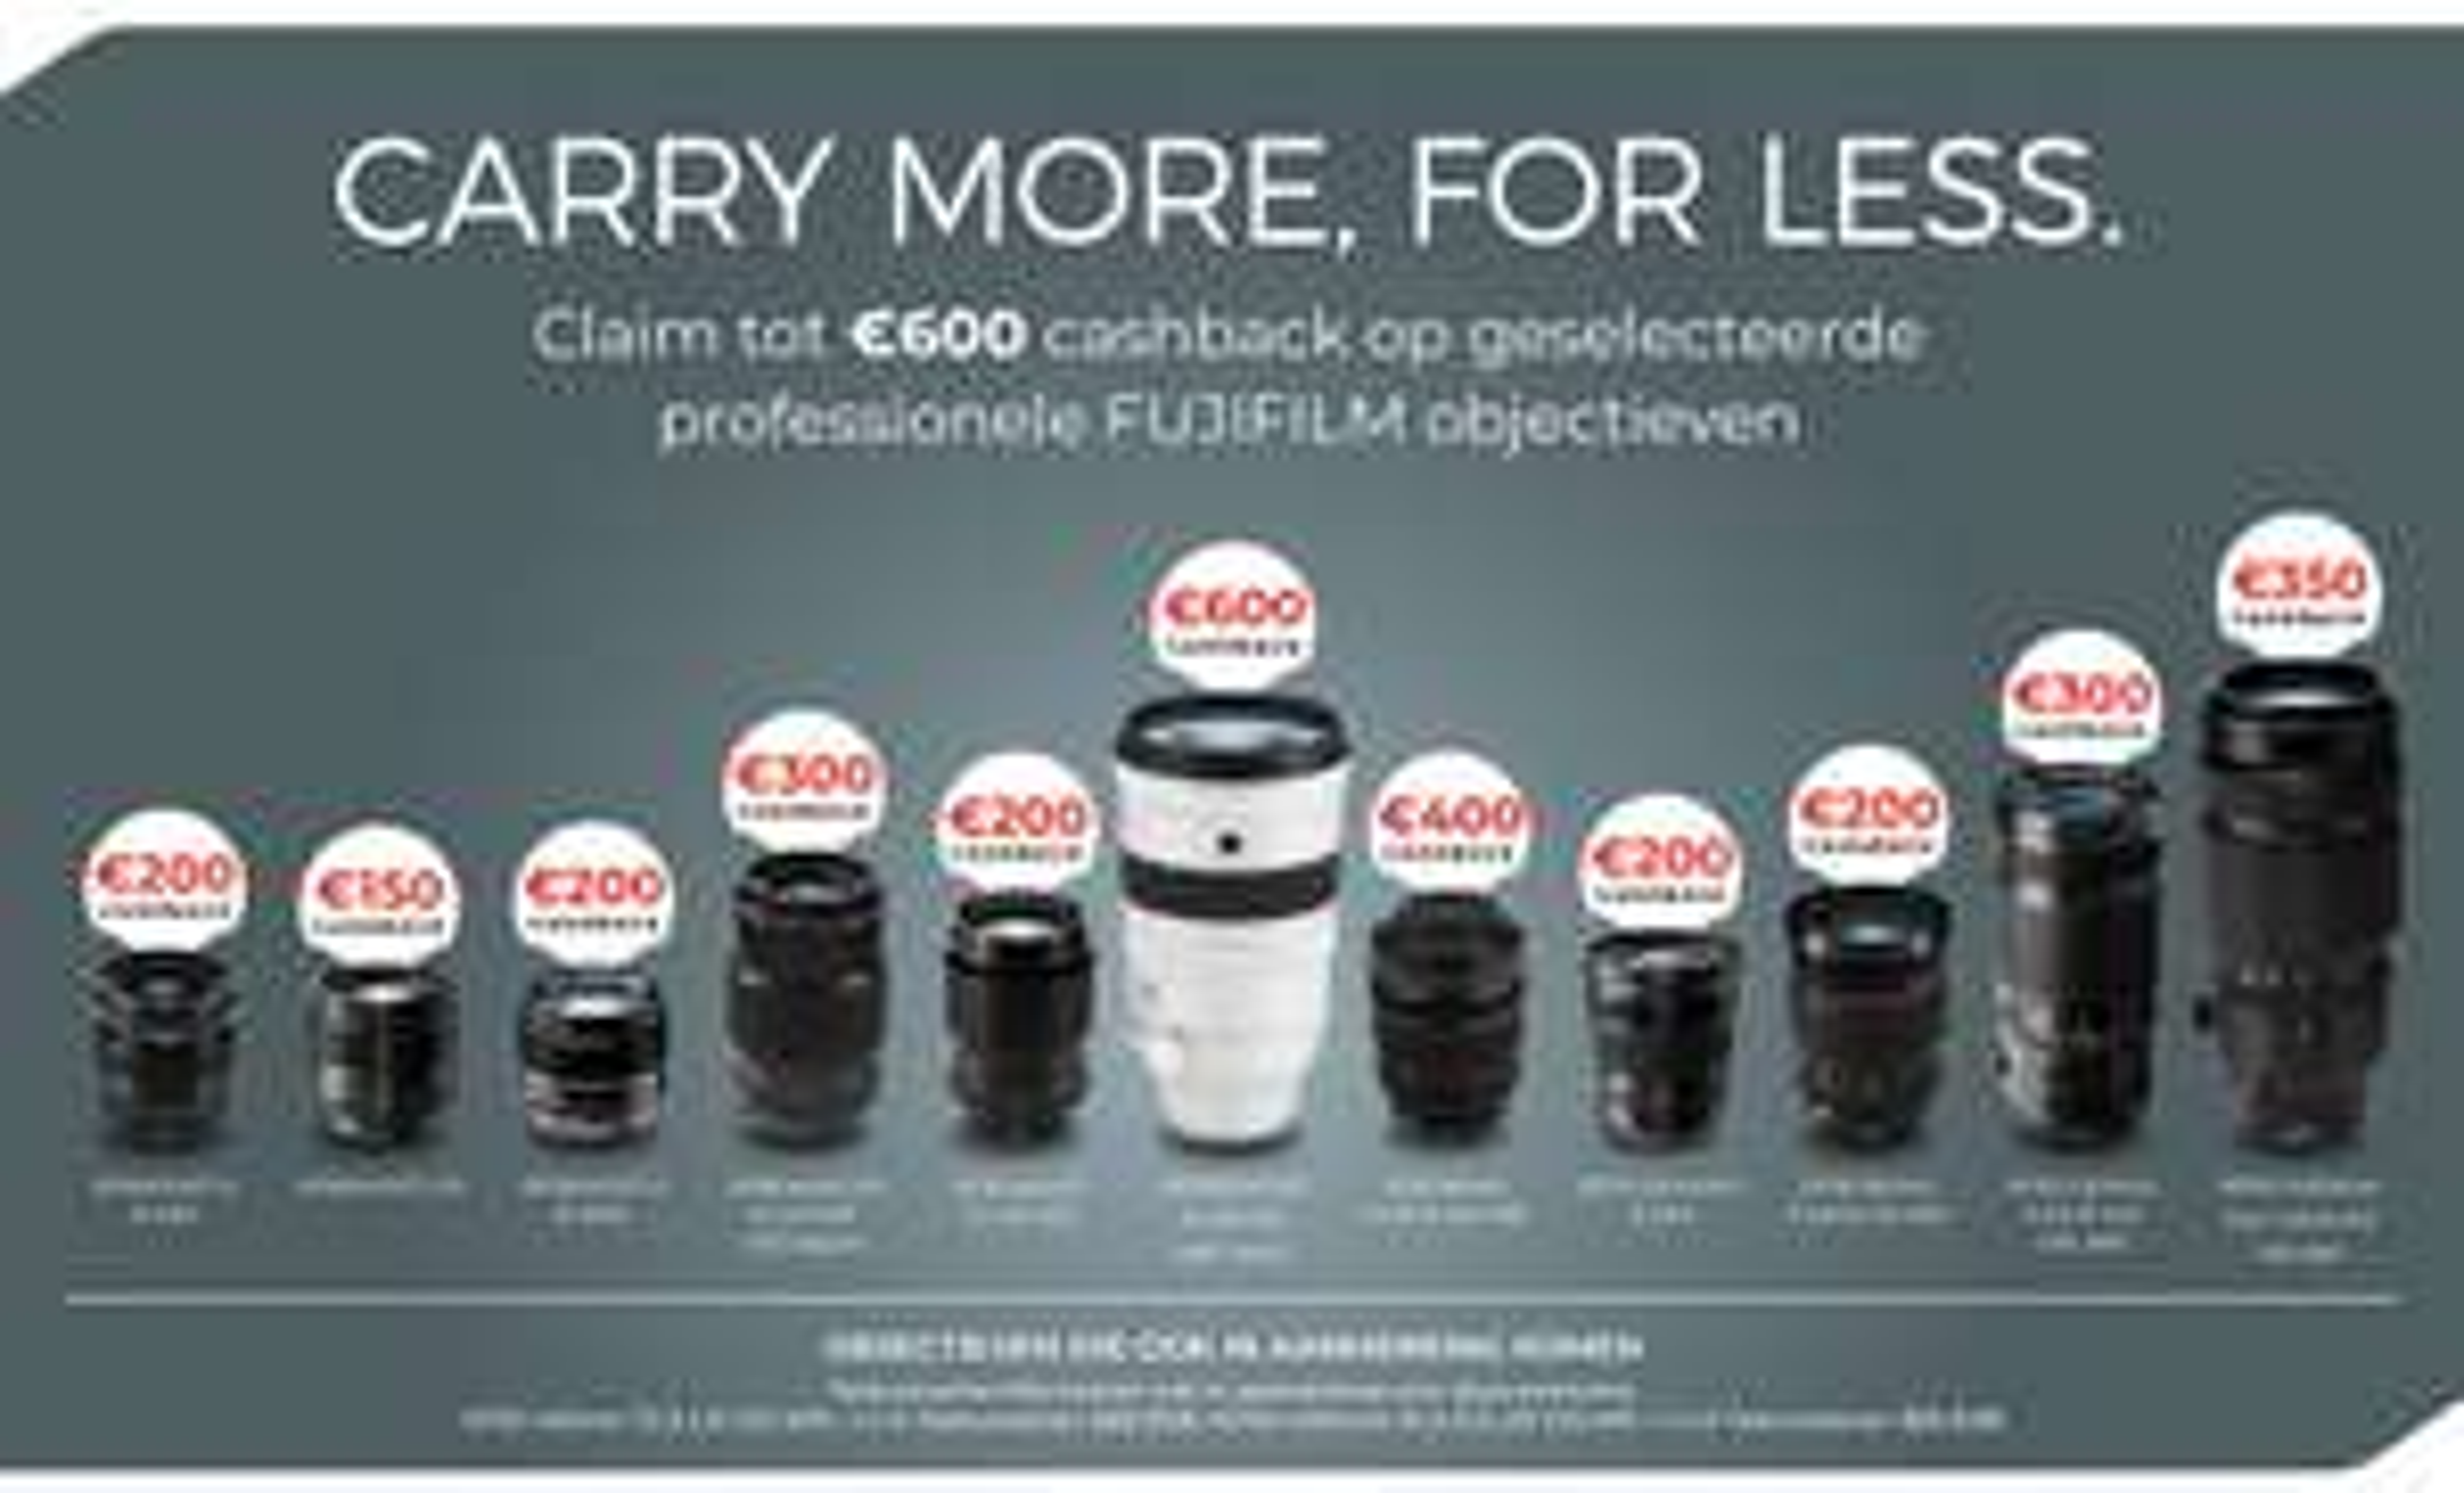 Fujifilm objectieven tot 600,- cashback